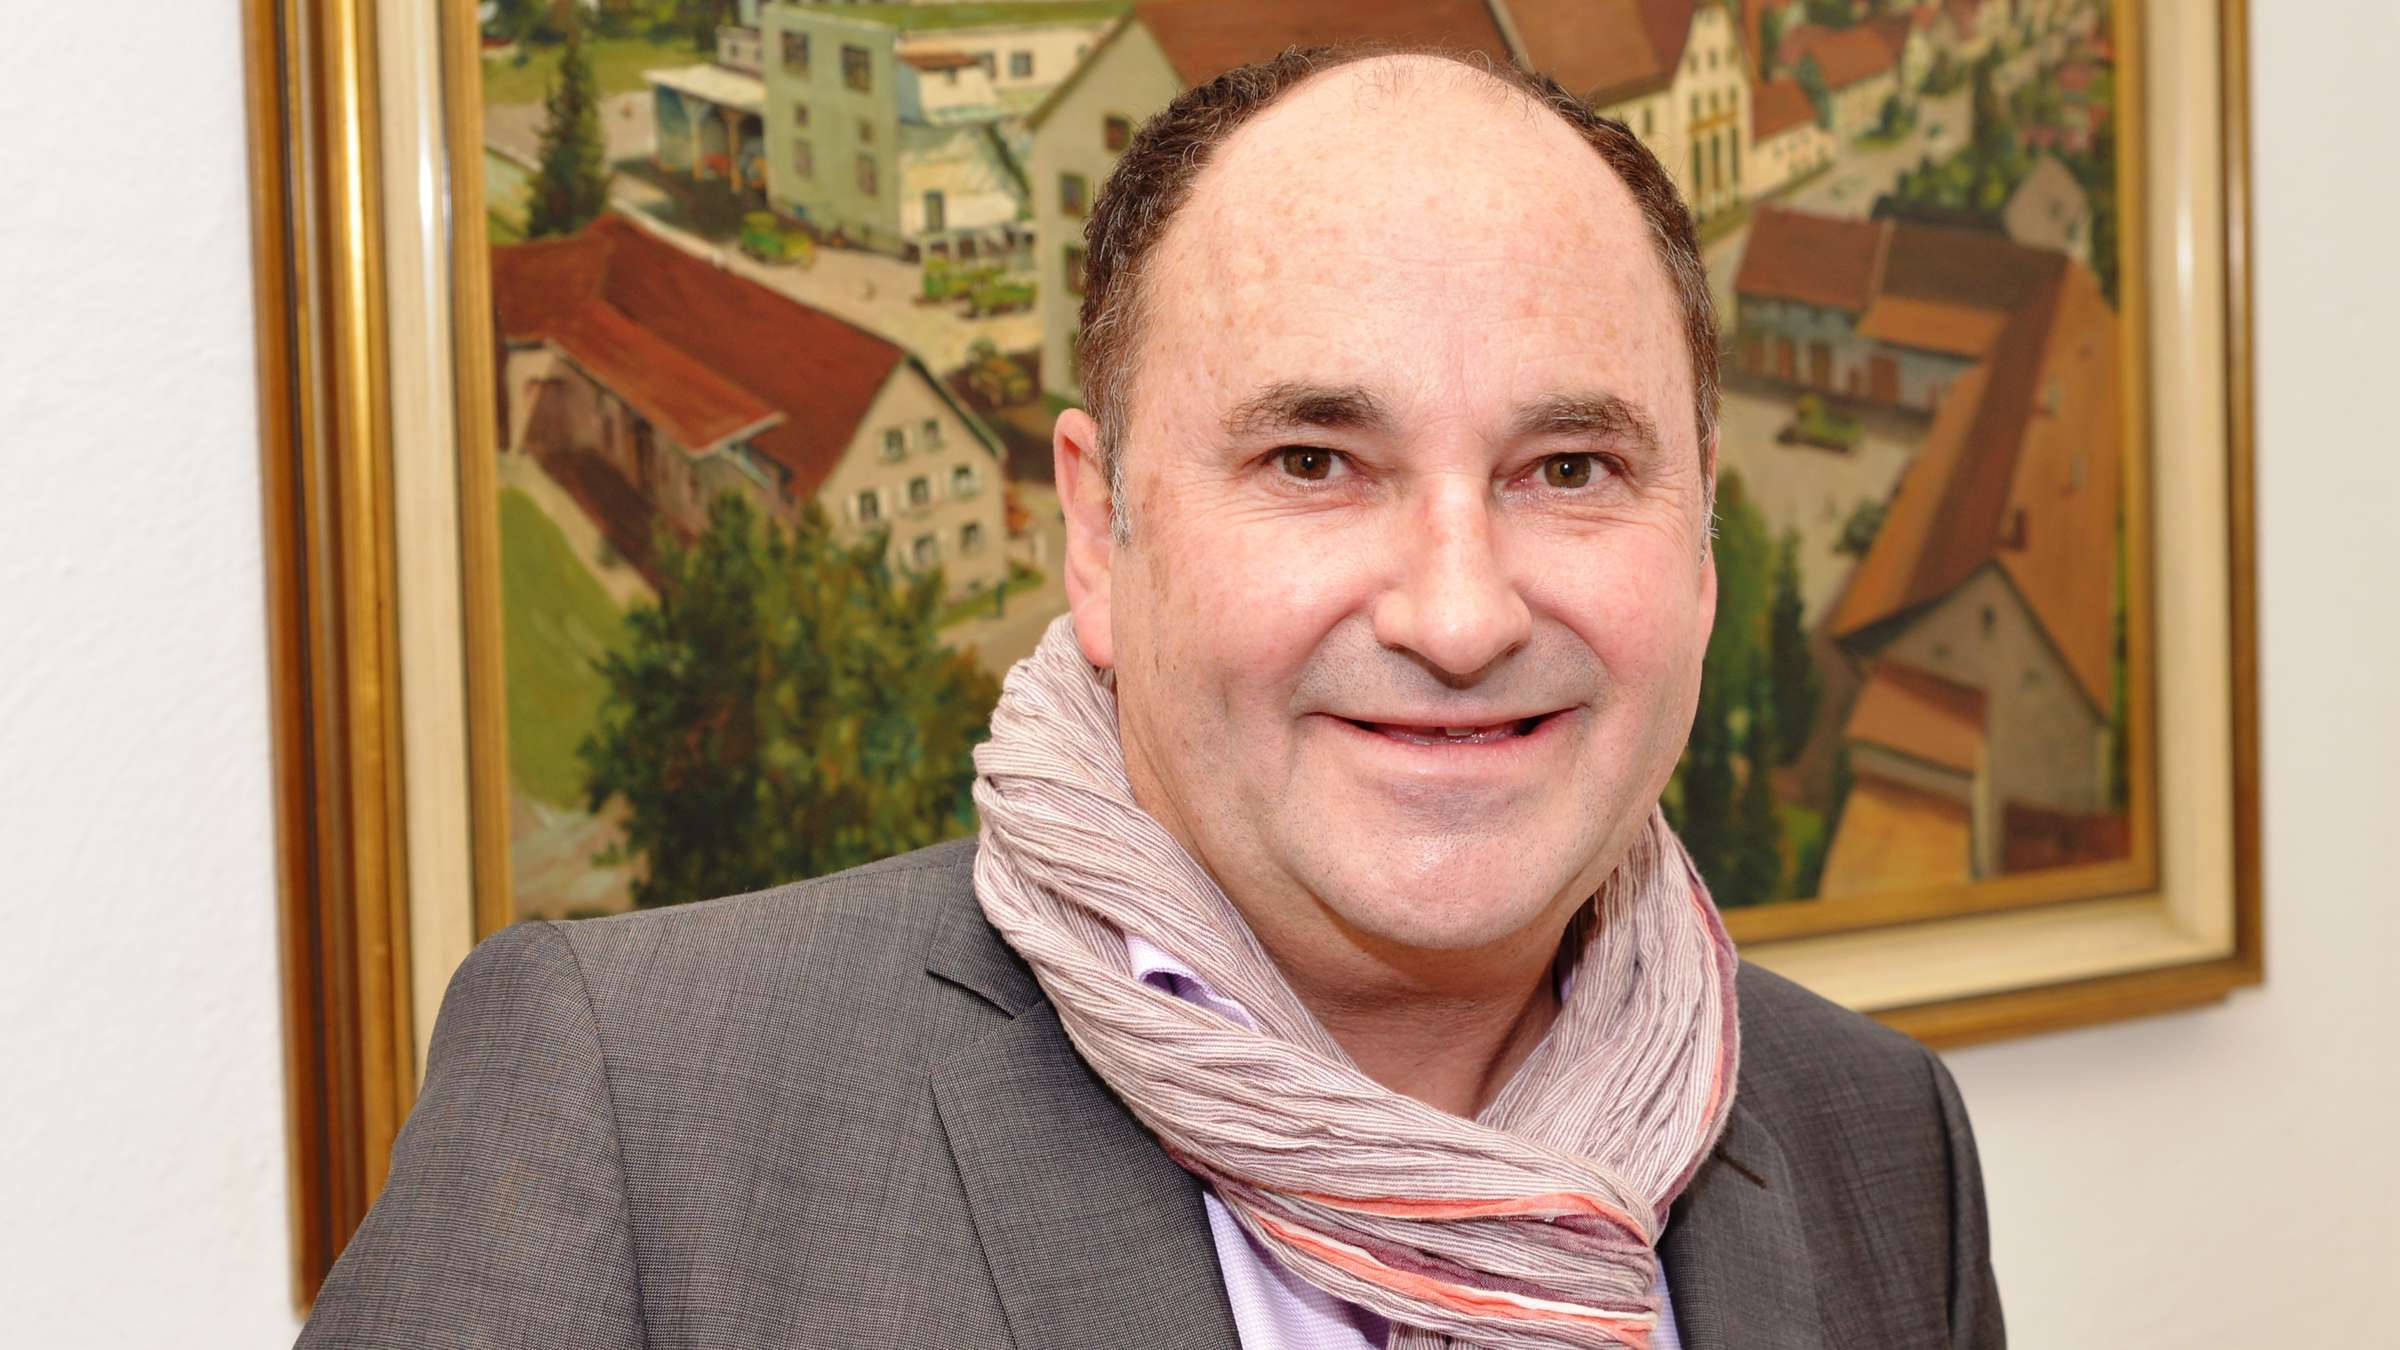 Patrick Kukuck - Josef Wieser